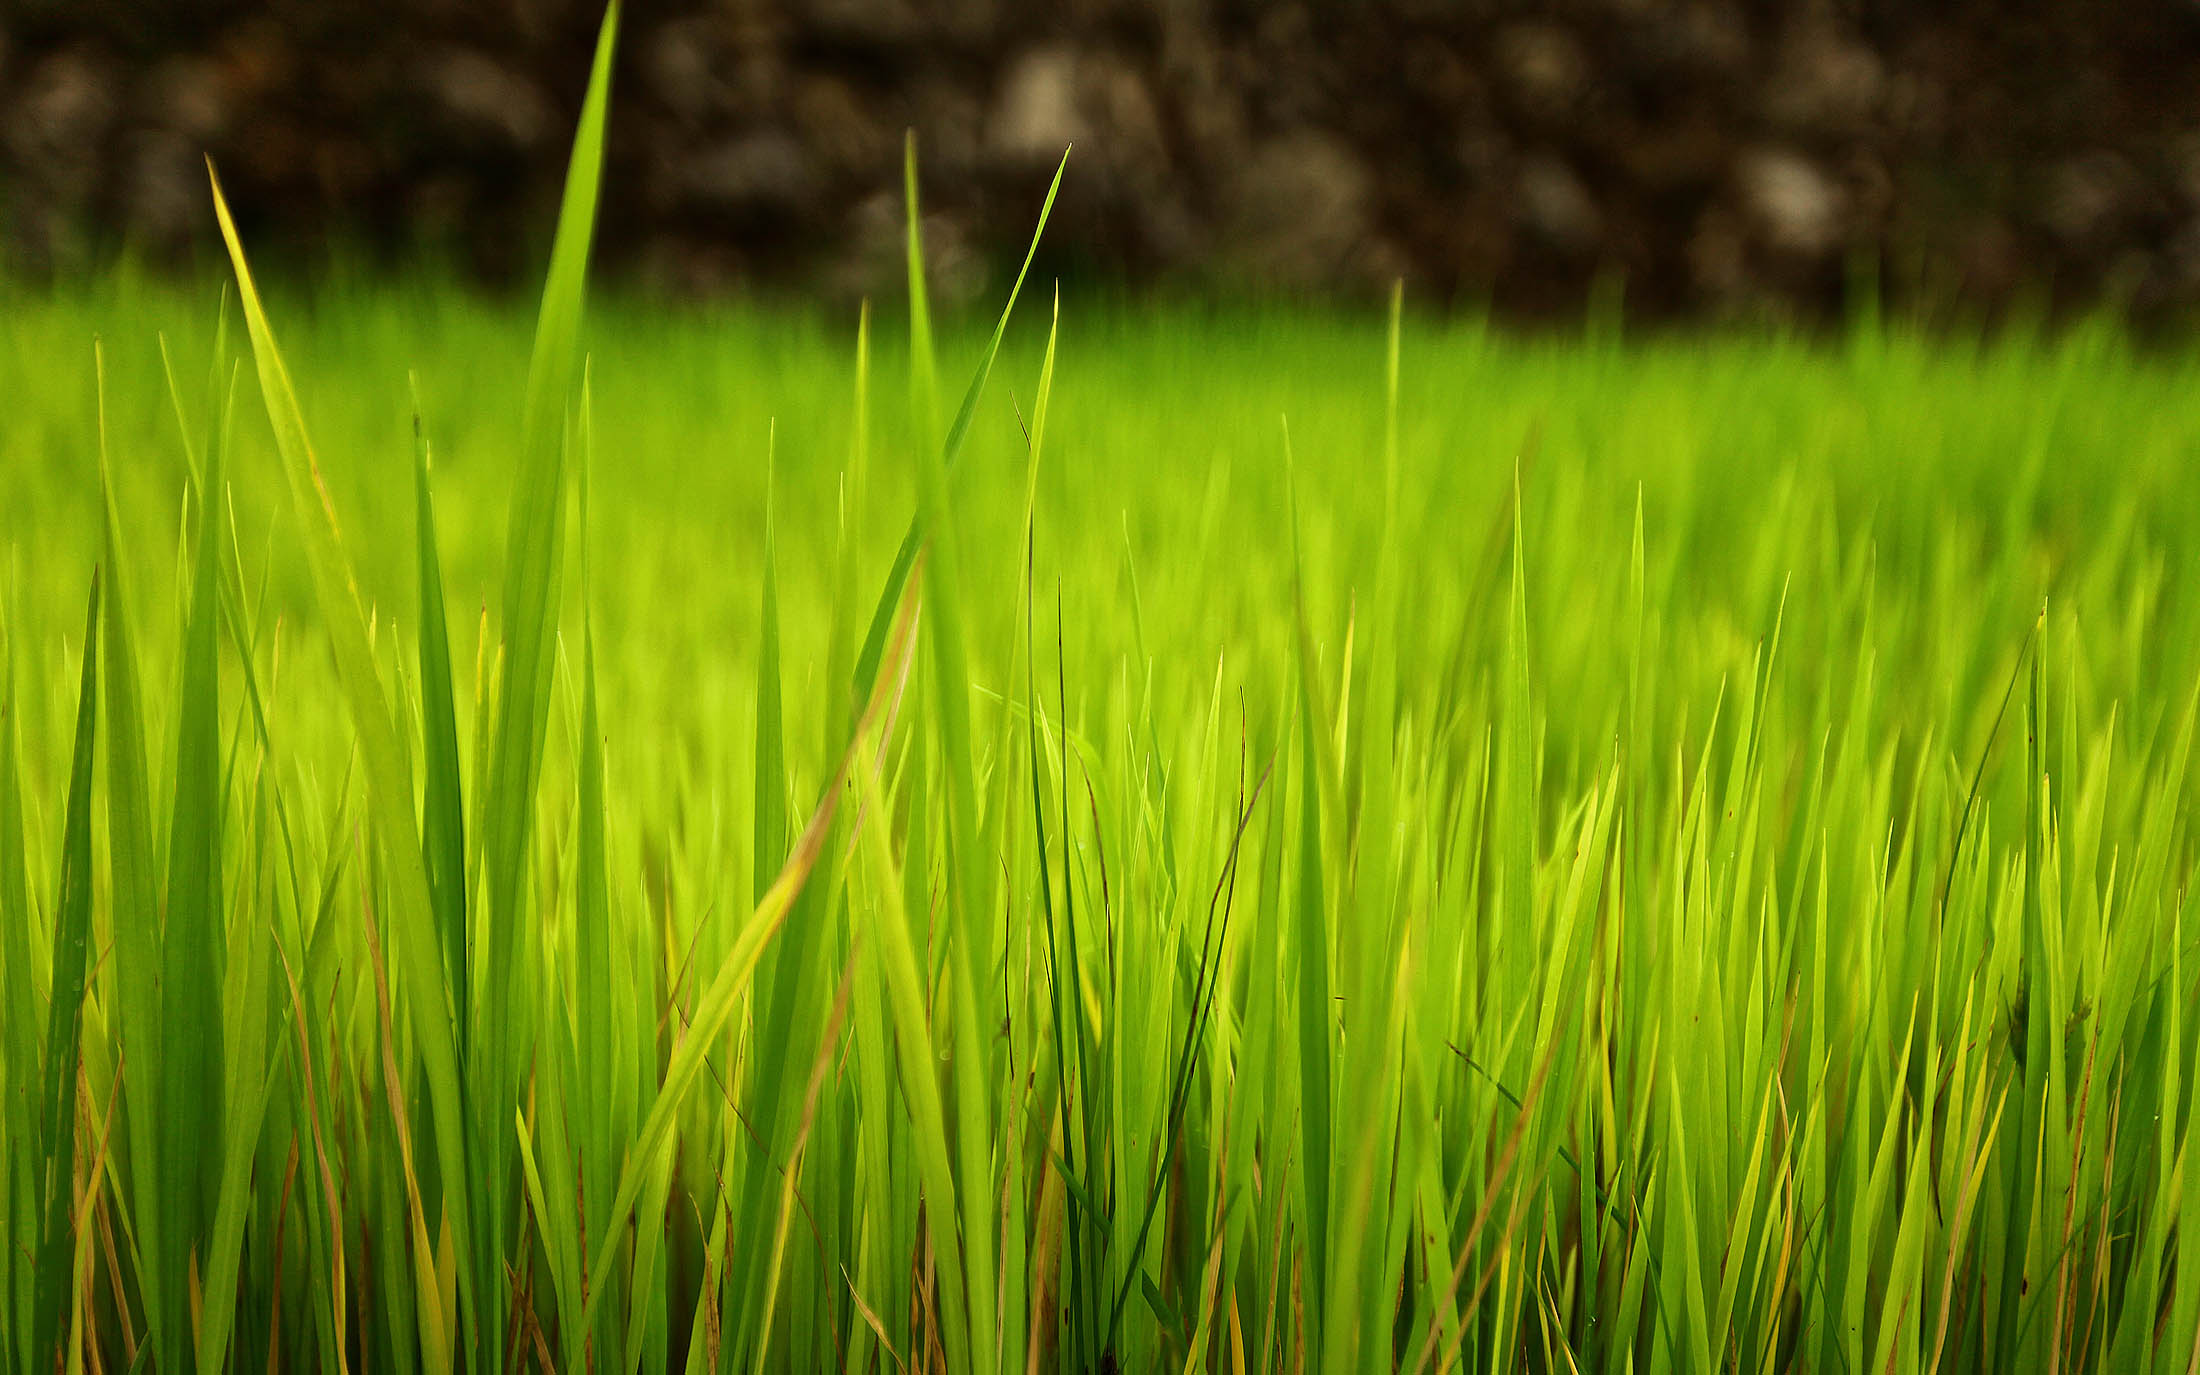 Rice fields in Philippines